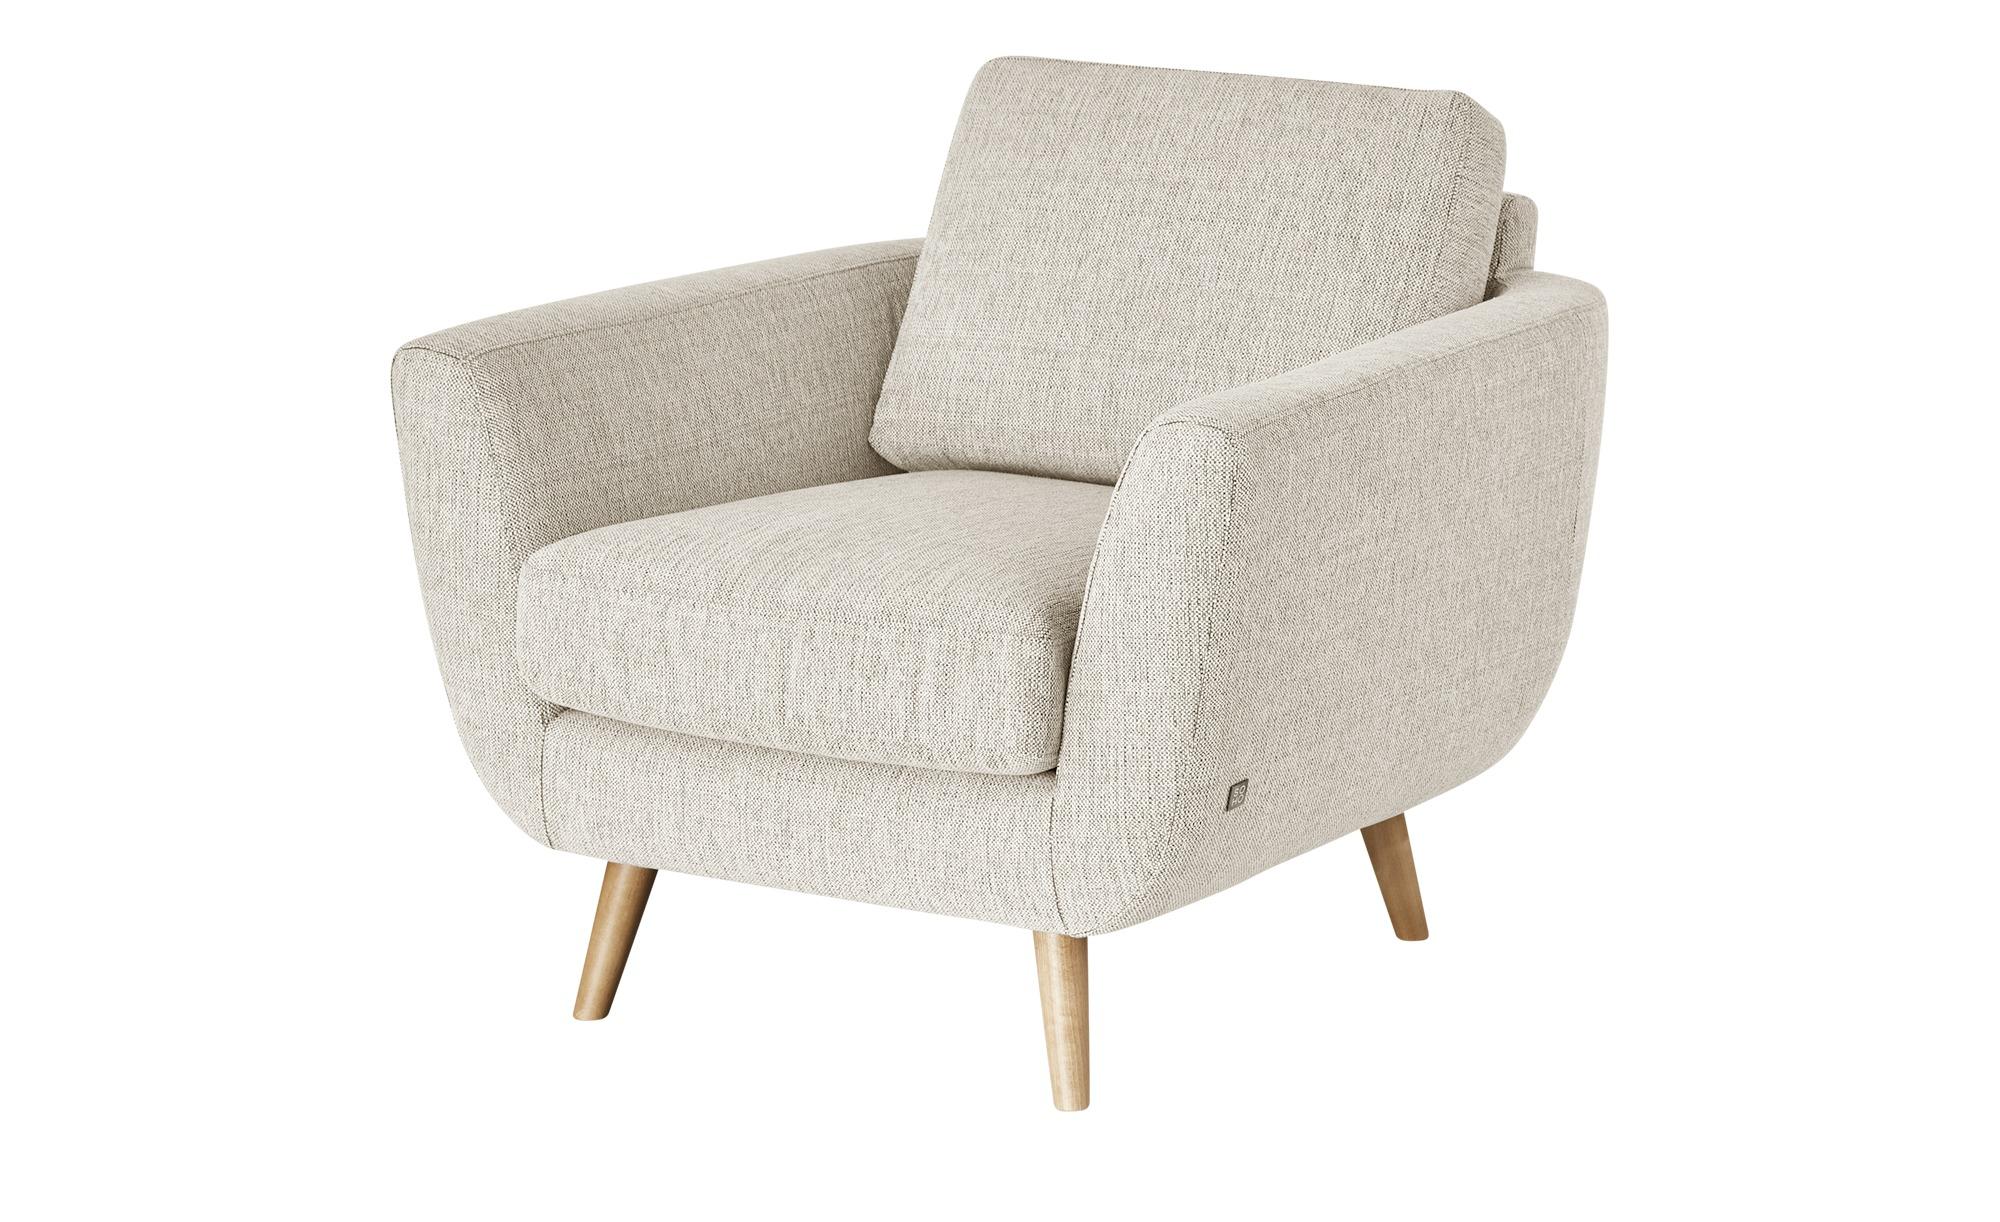 SOHO Sessel  Smilla ¦ beige ¦ Maße (cm): B: 94 H: 85 T: 93 Polstermöbel > Sessel > Ohrensessel - Höffner